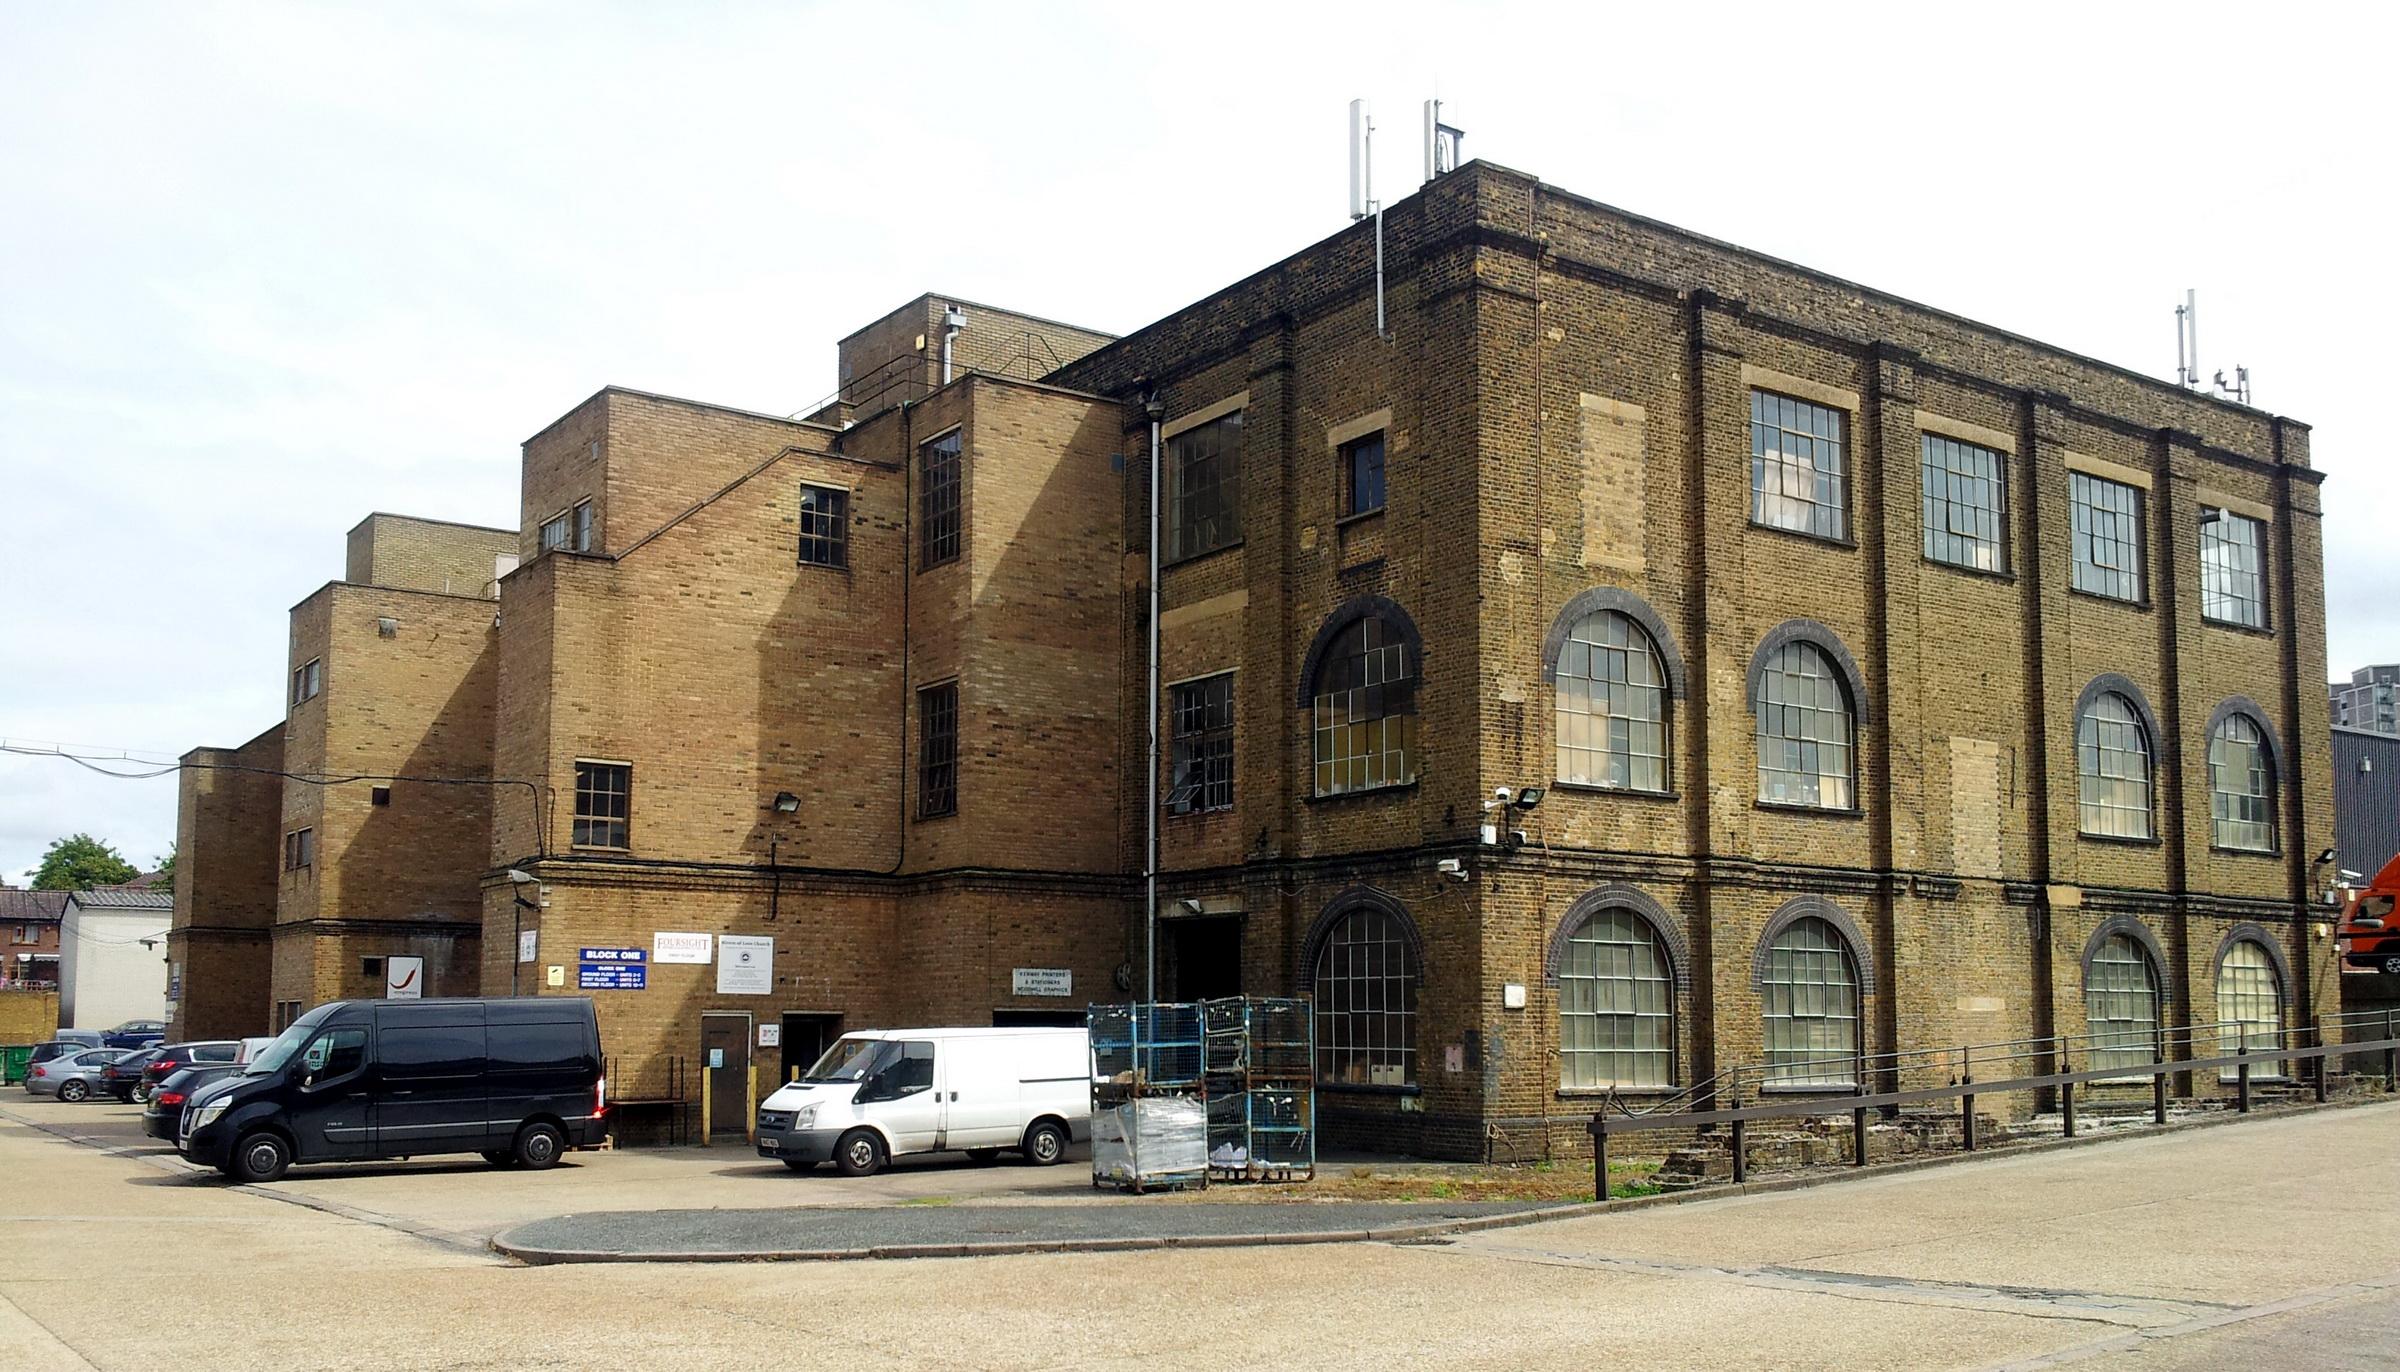 ... , Woolwich Dockyard, old factory building 2.jpg - Wikimedia Commons Old Factory Building